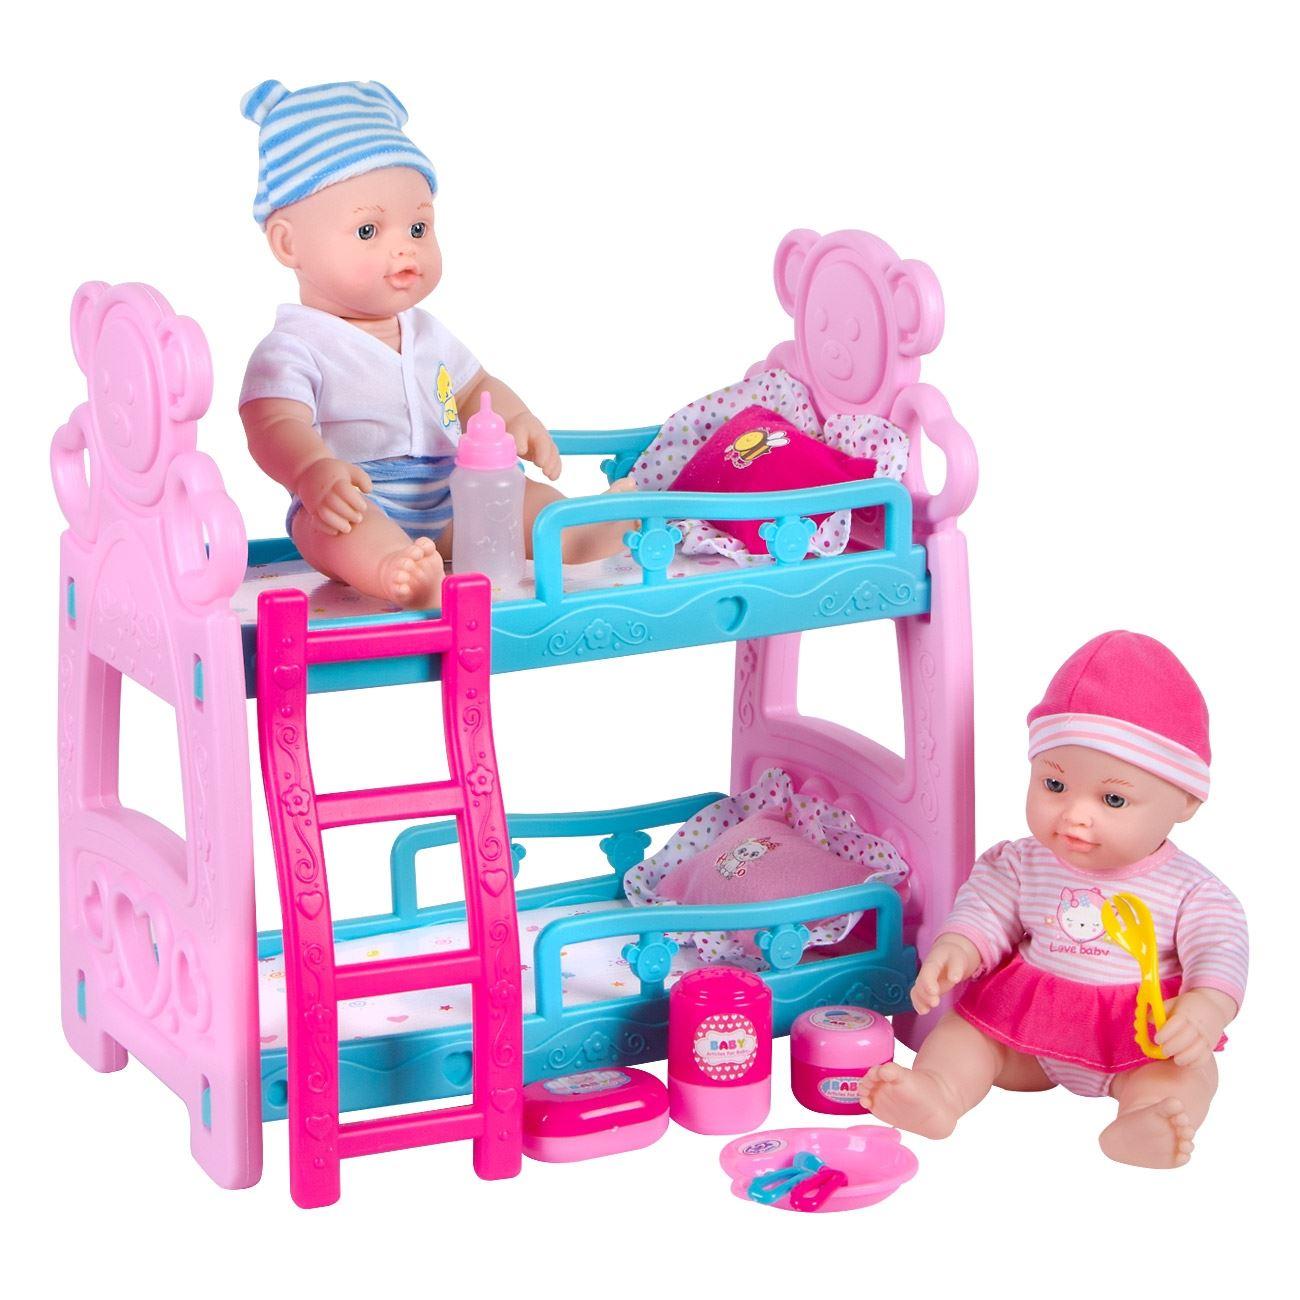 869e4fccac5 Κρεβατάκι Κουκέτα με 2 Μωρά & Αξεσουάρ < Σετ Μωρά | Jumbo